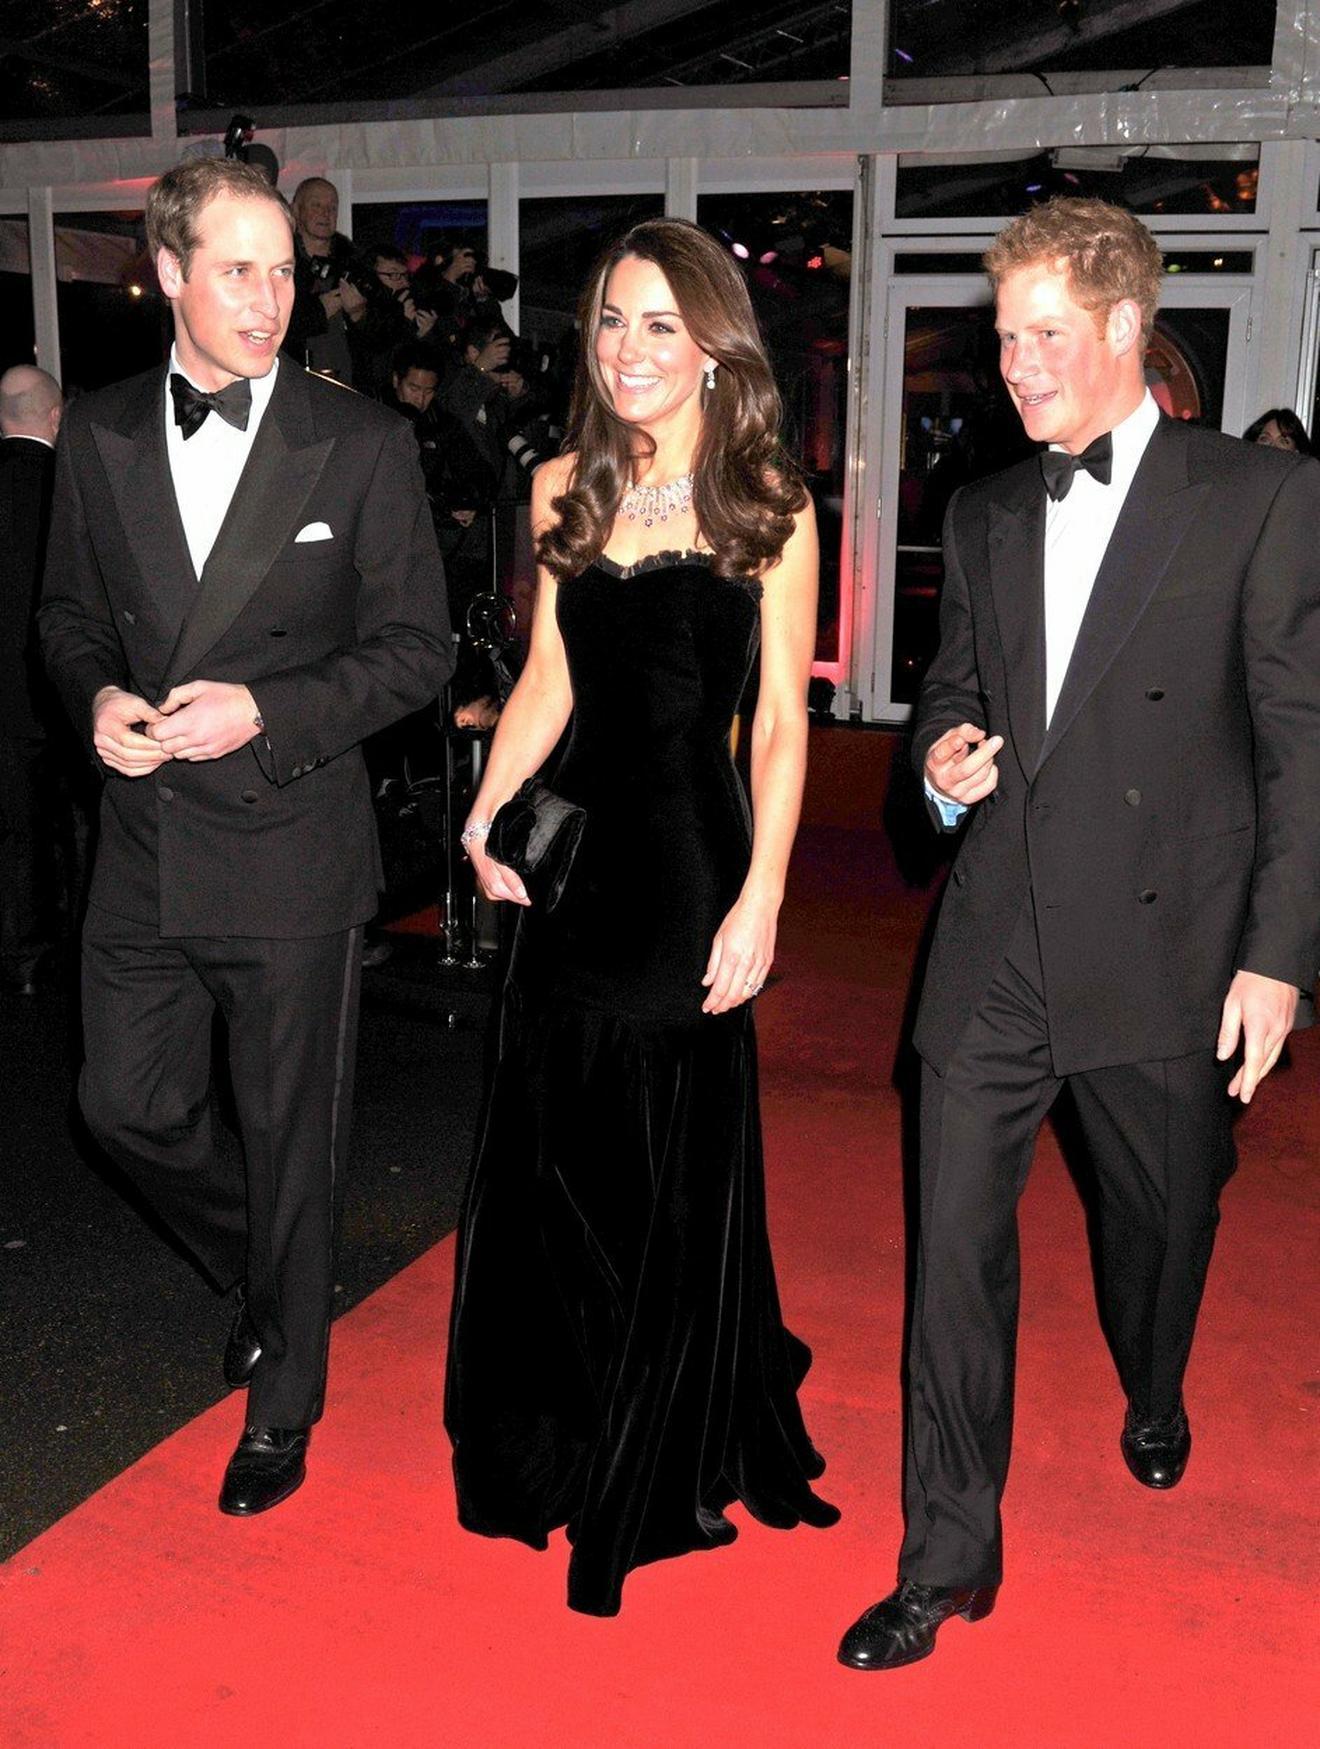 Jedno od prvih javnih pojavljivanja vojvotkinje i vojvode od Kembridža: sa Kejt i Viliijamom je 2011. na dodeli